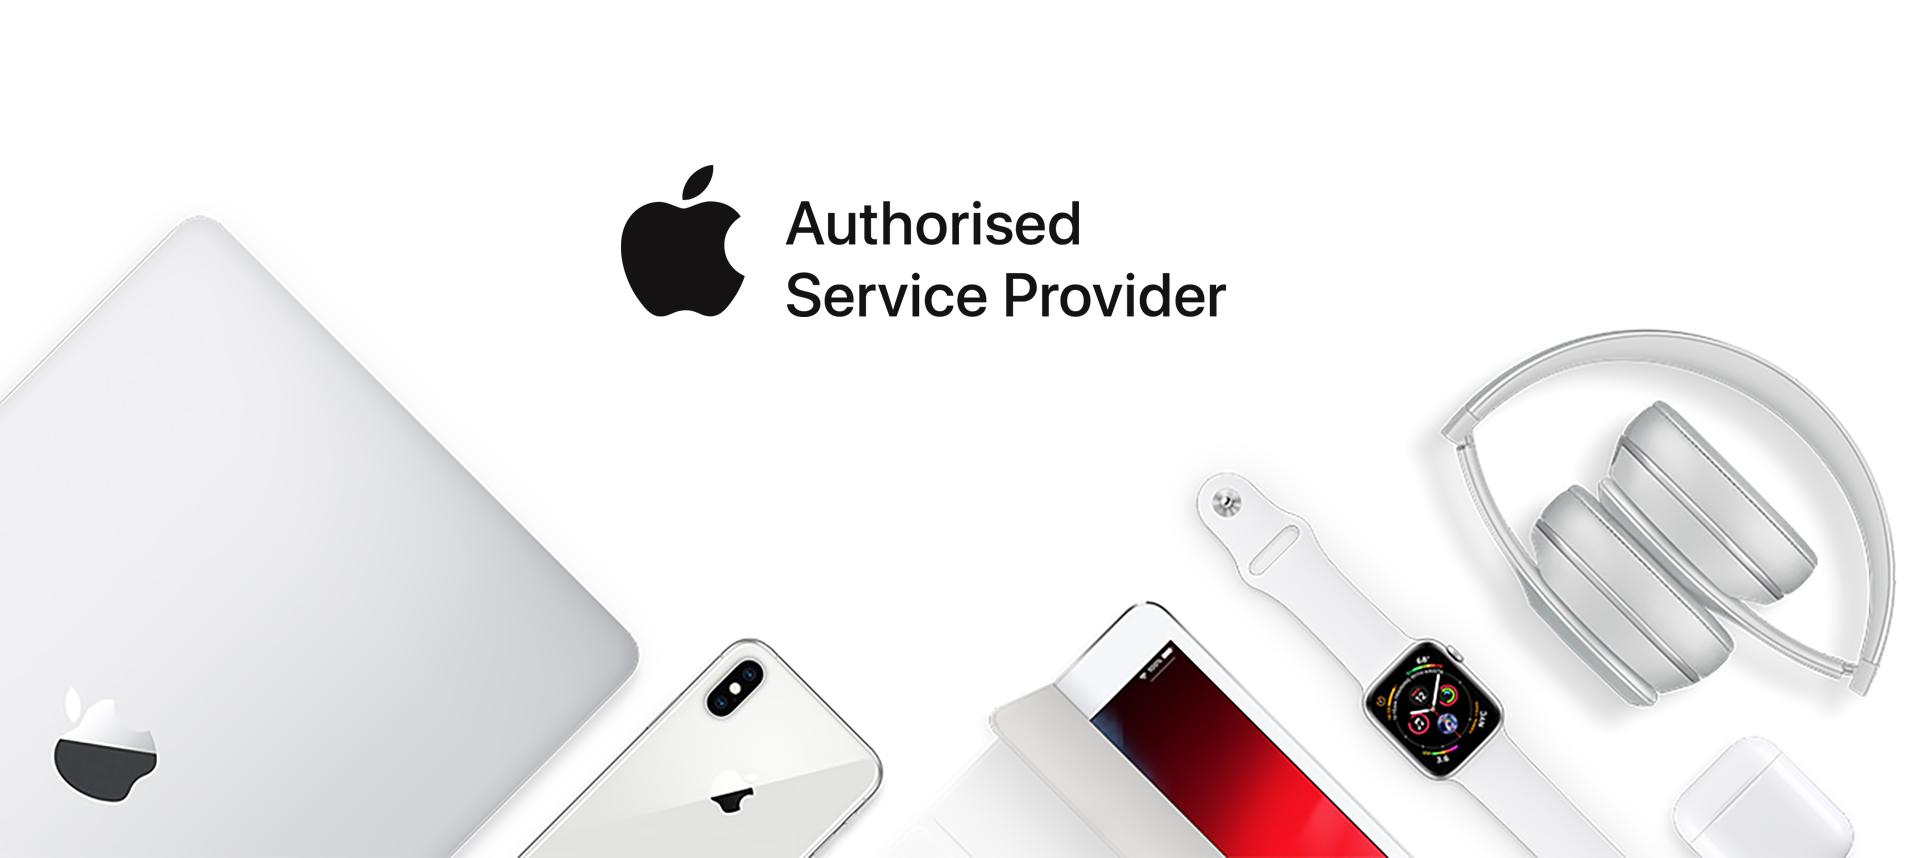 authorised service provider